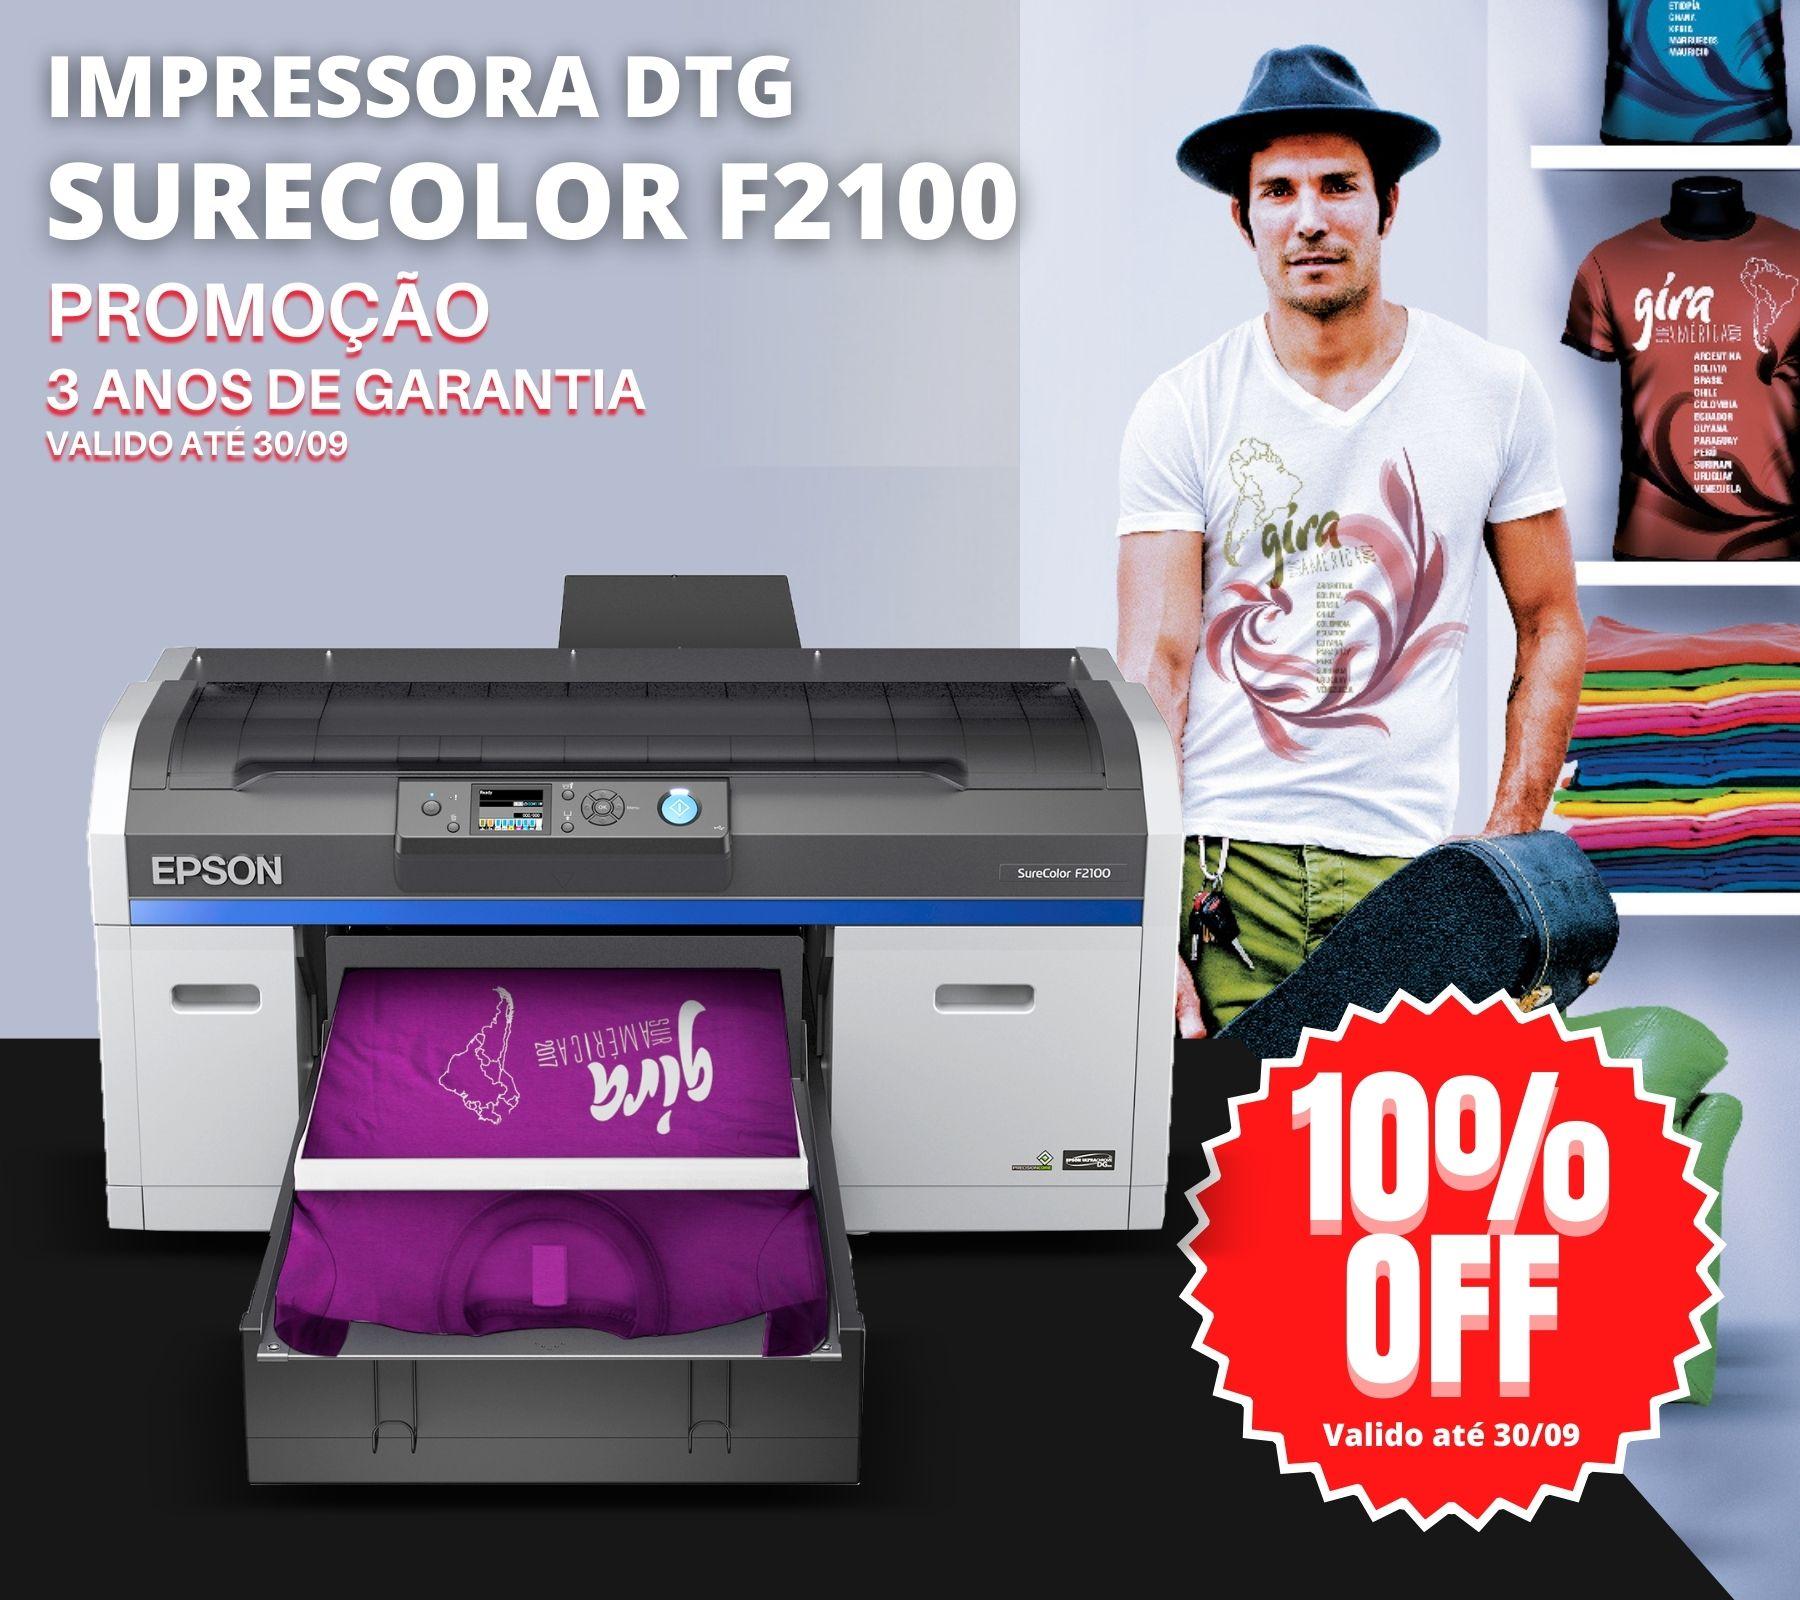 Impressora DTG -Direct to Garmet - Epson SureColor F2100